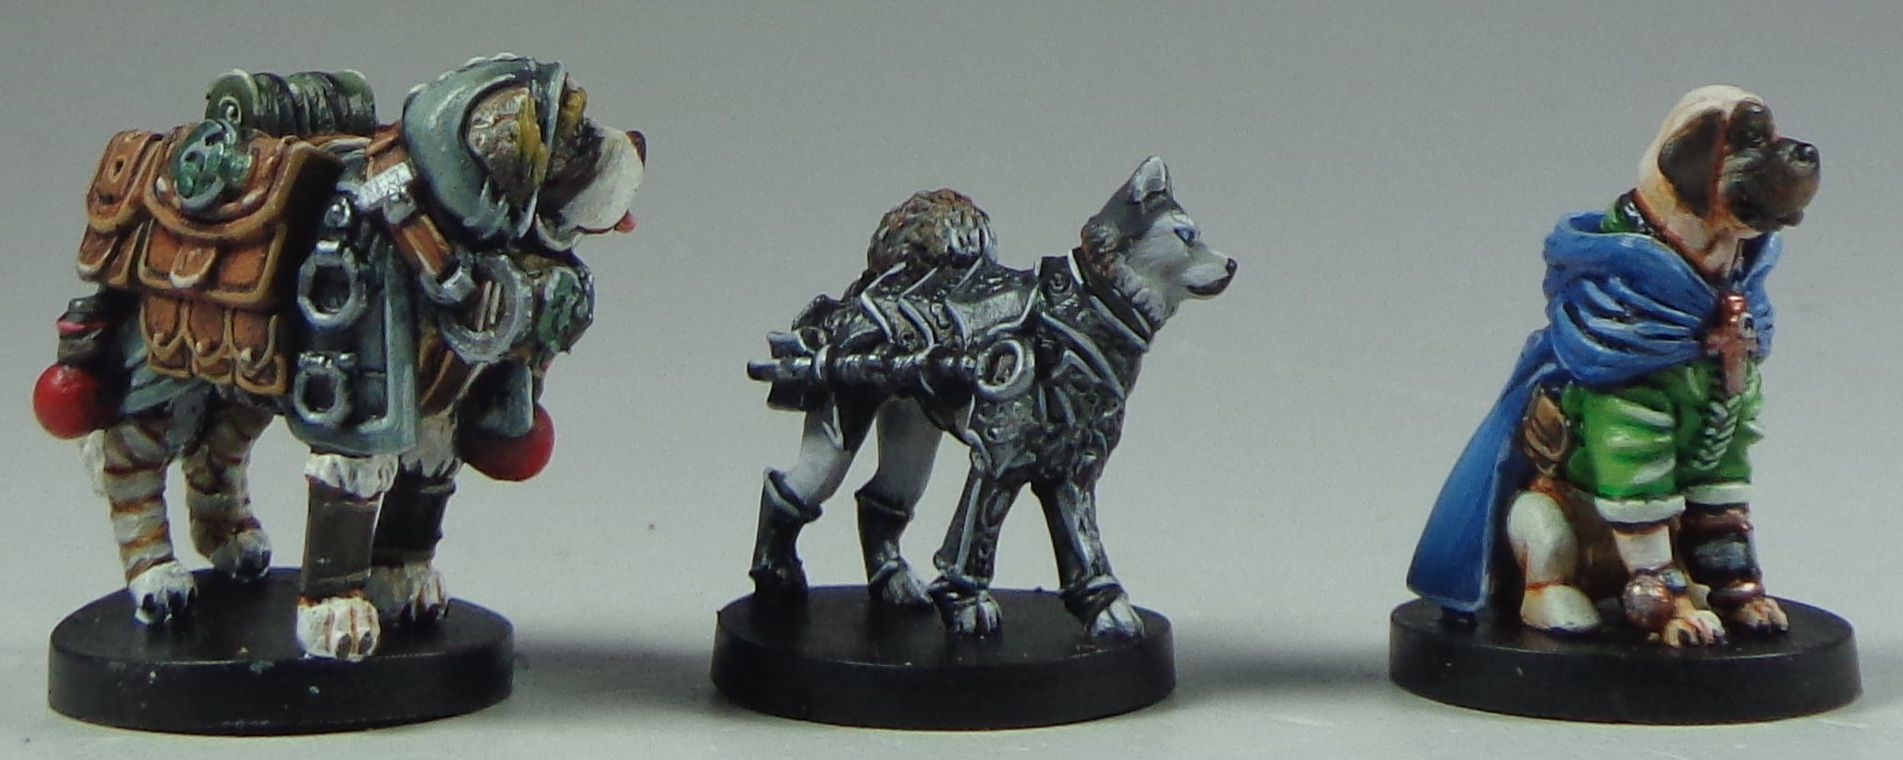 Paintedfigs+Miniature+Painting+Service+KL+Dungeons+%26+Doggies+%287%29.jpg